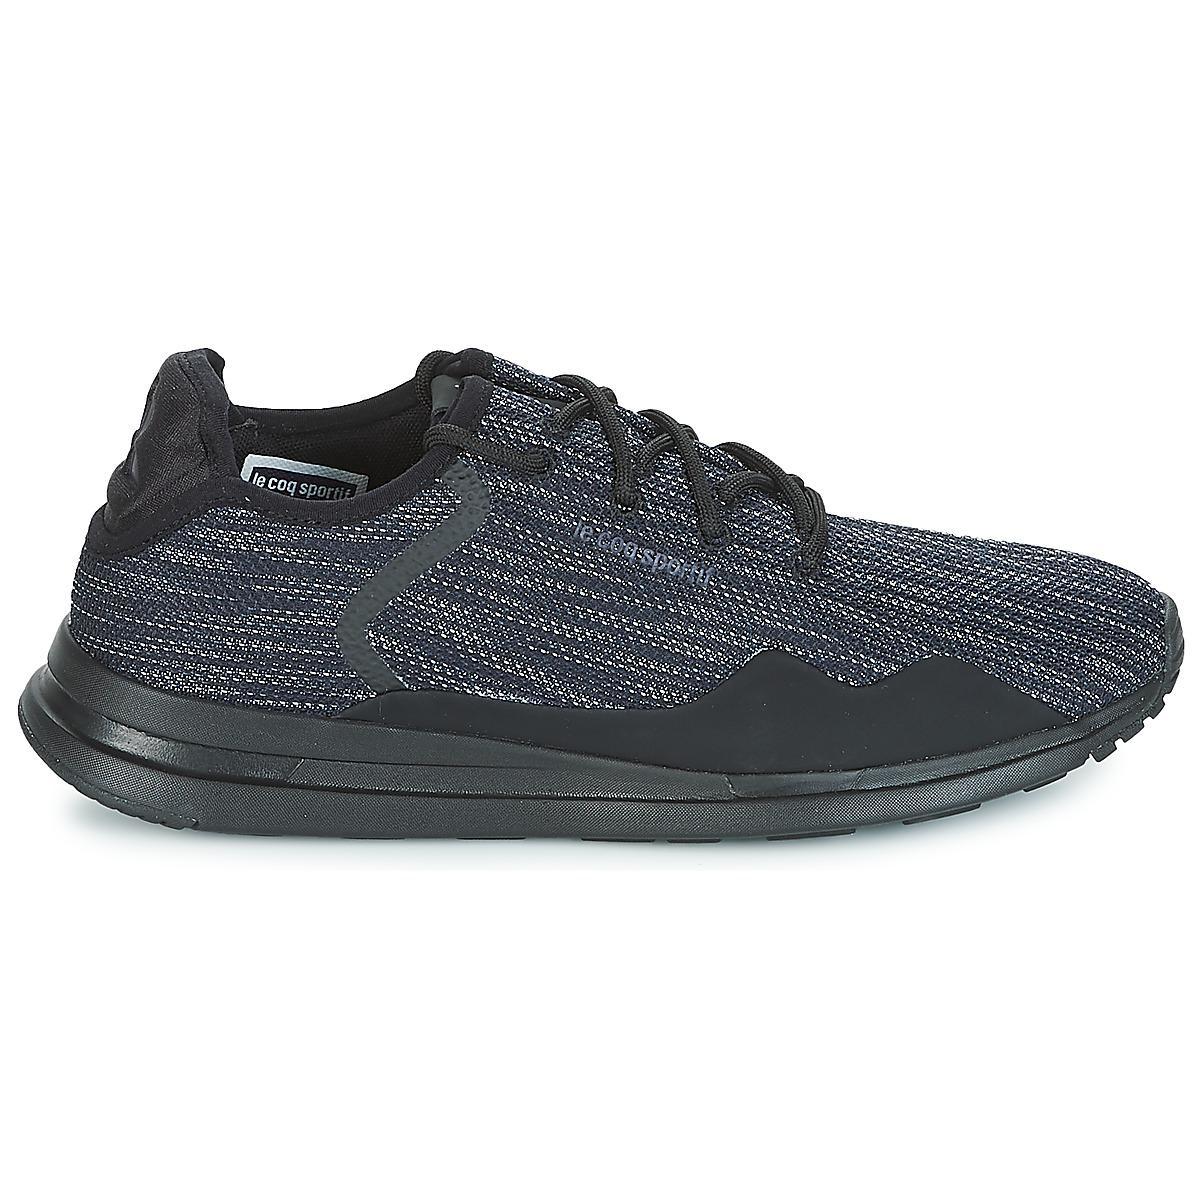 f7c022d3cf68 Le Coq Sportif - Solas Premium Men s Shoes (trainers) In Black for Men -.  View fullscreen